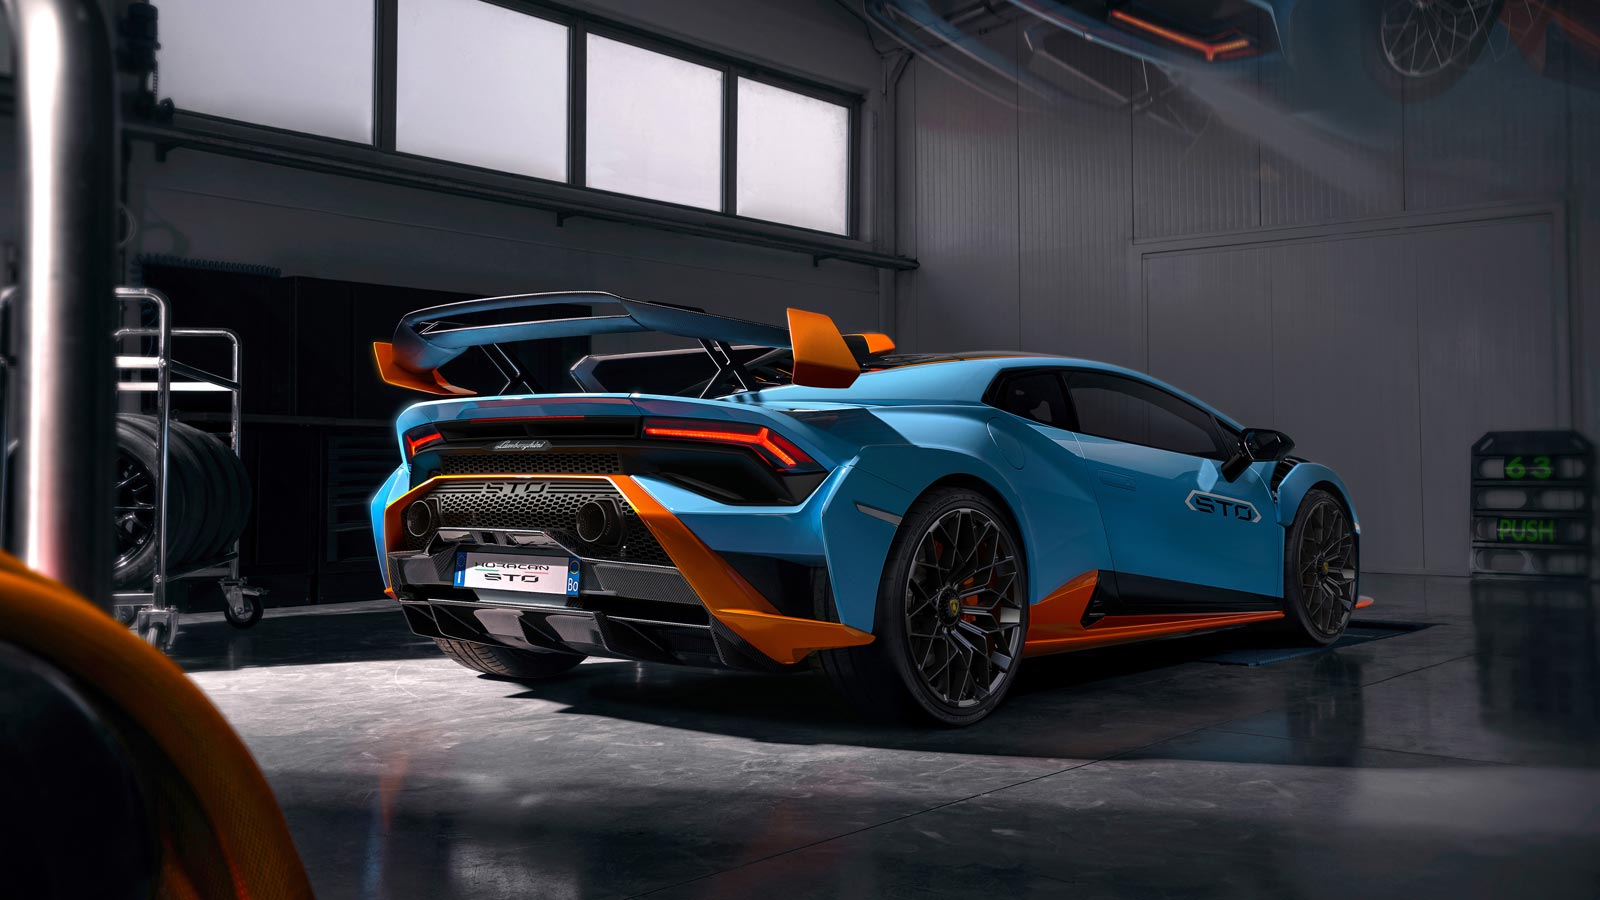 Lamborghini Huracan STO - From racetrack to road image 2